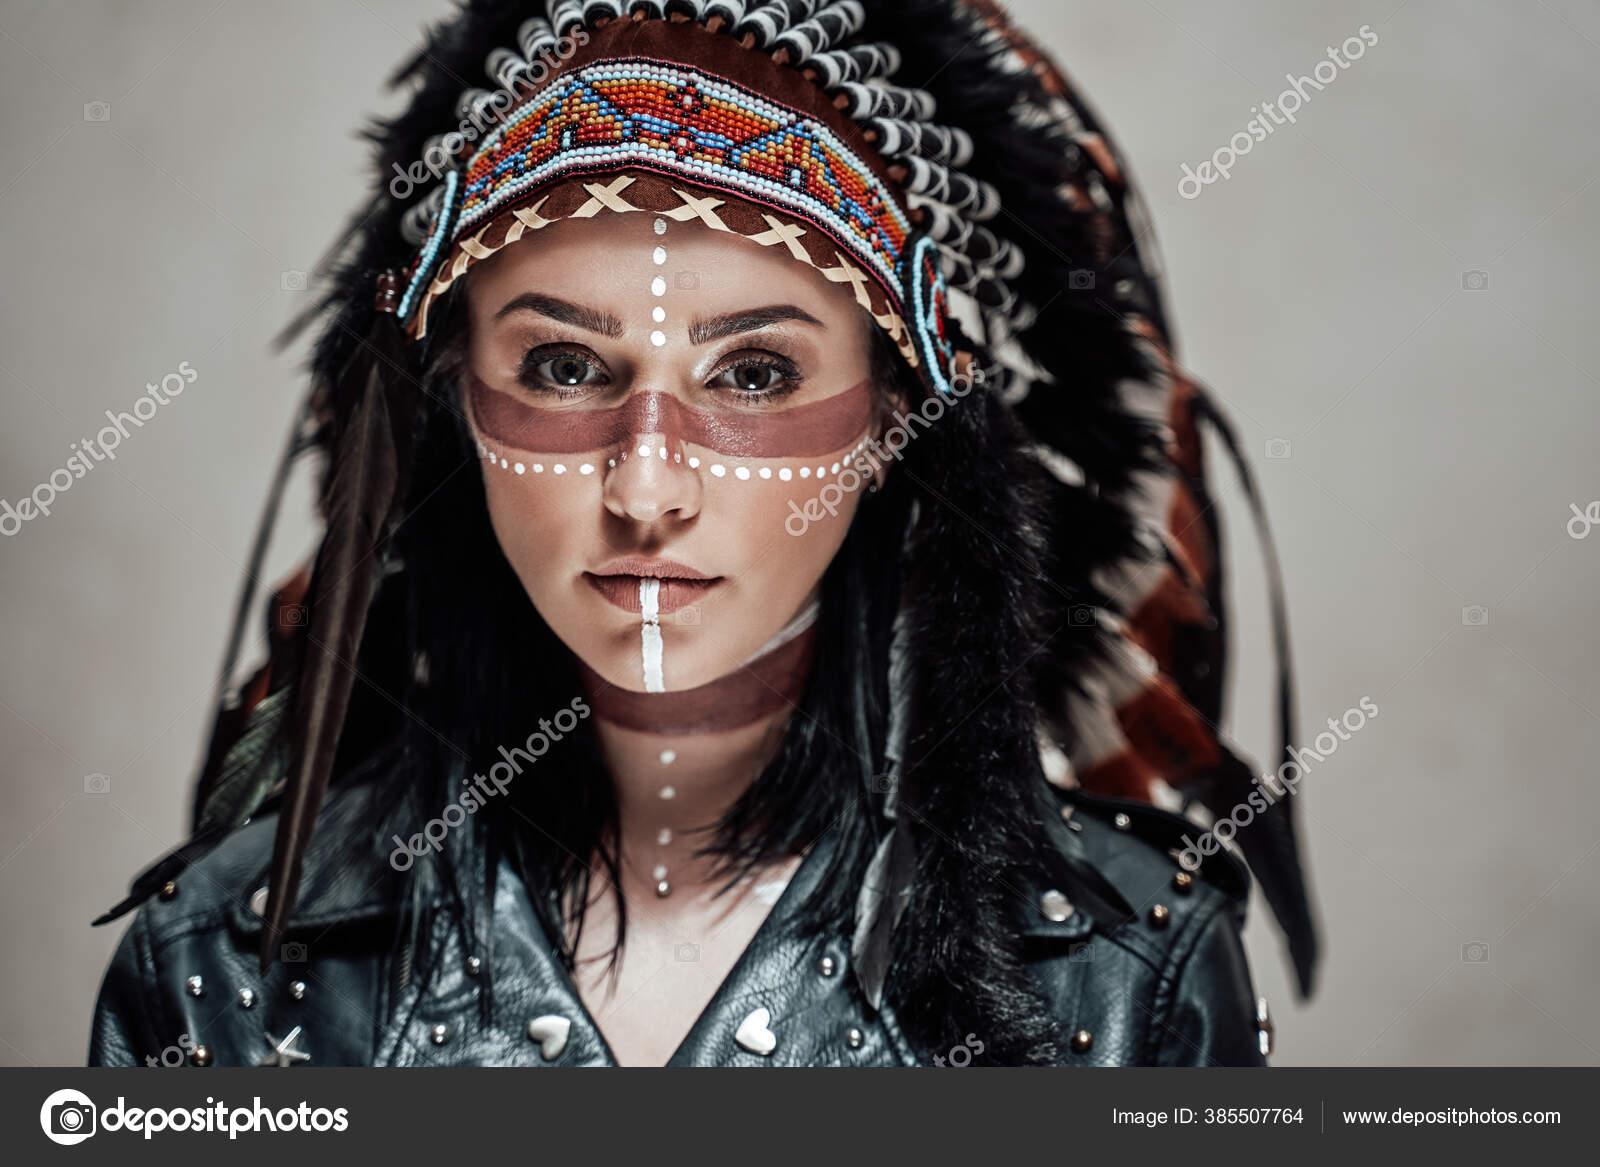 ᐈ Native American Model Female Stock Photos Royalty Free Native American Female Images Download On Depositphotos